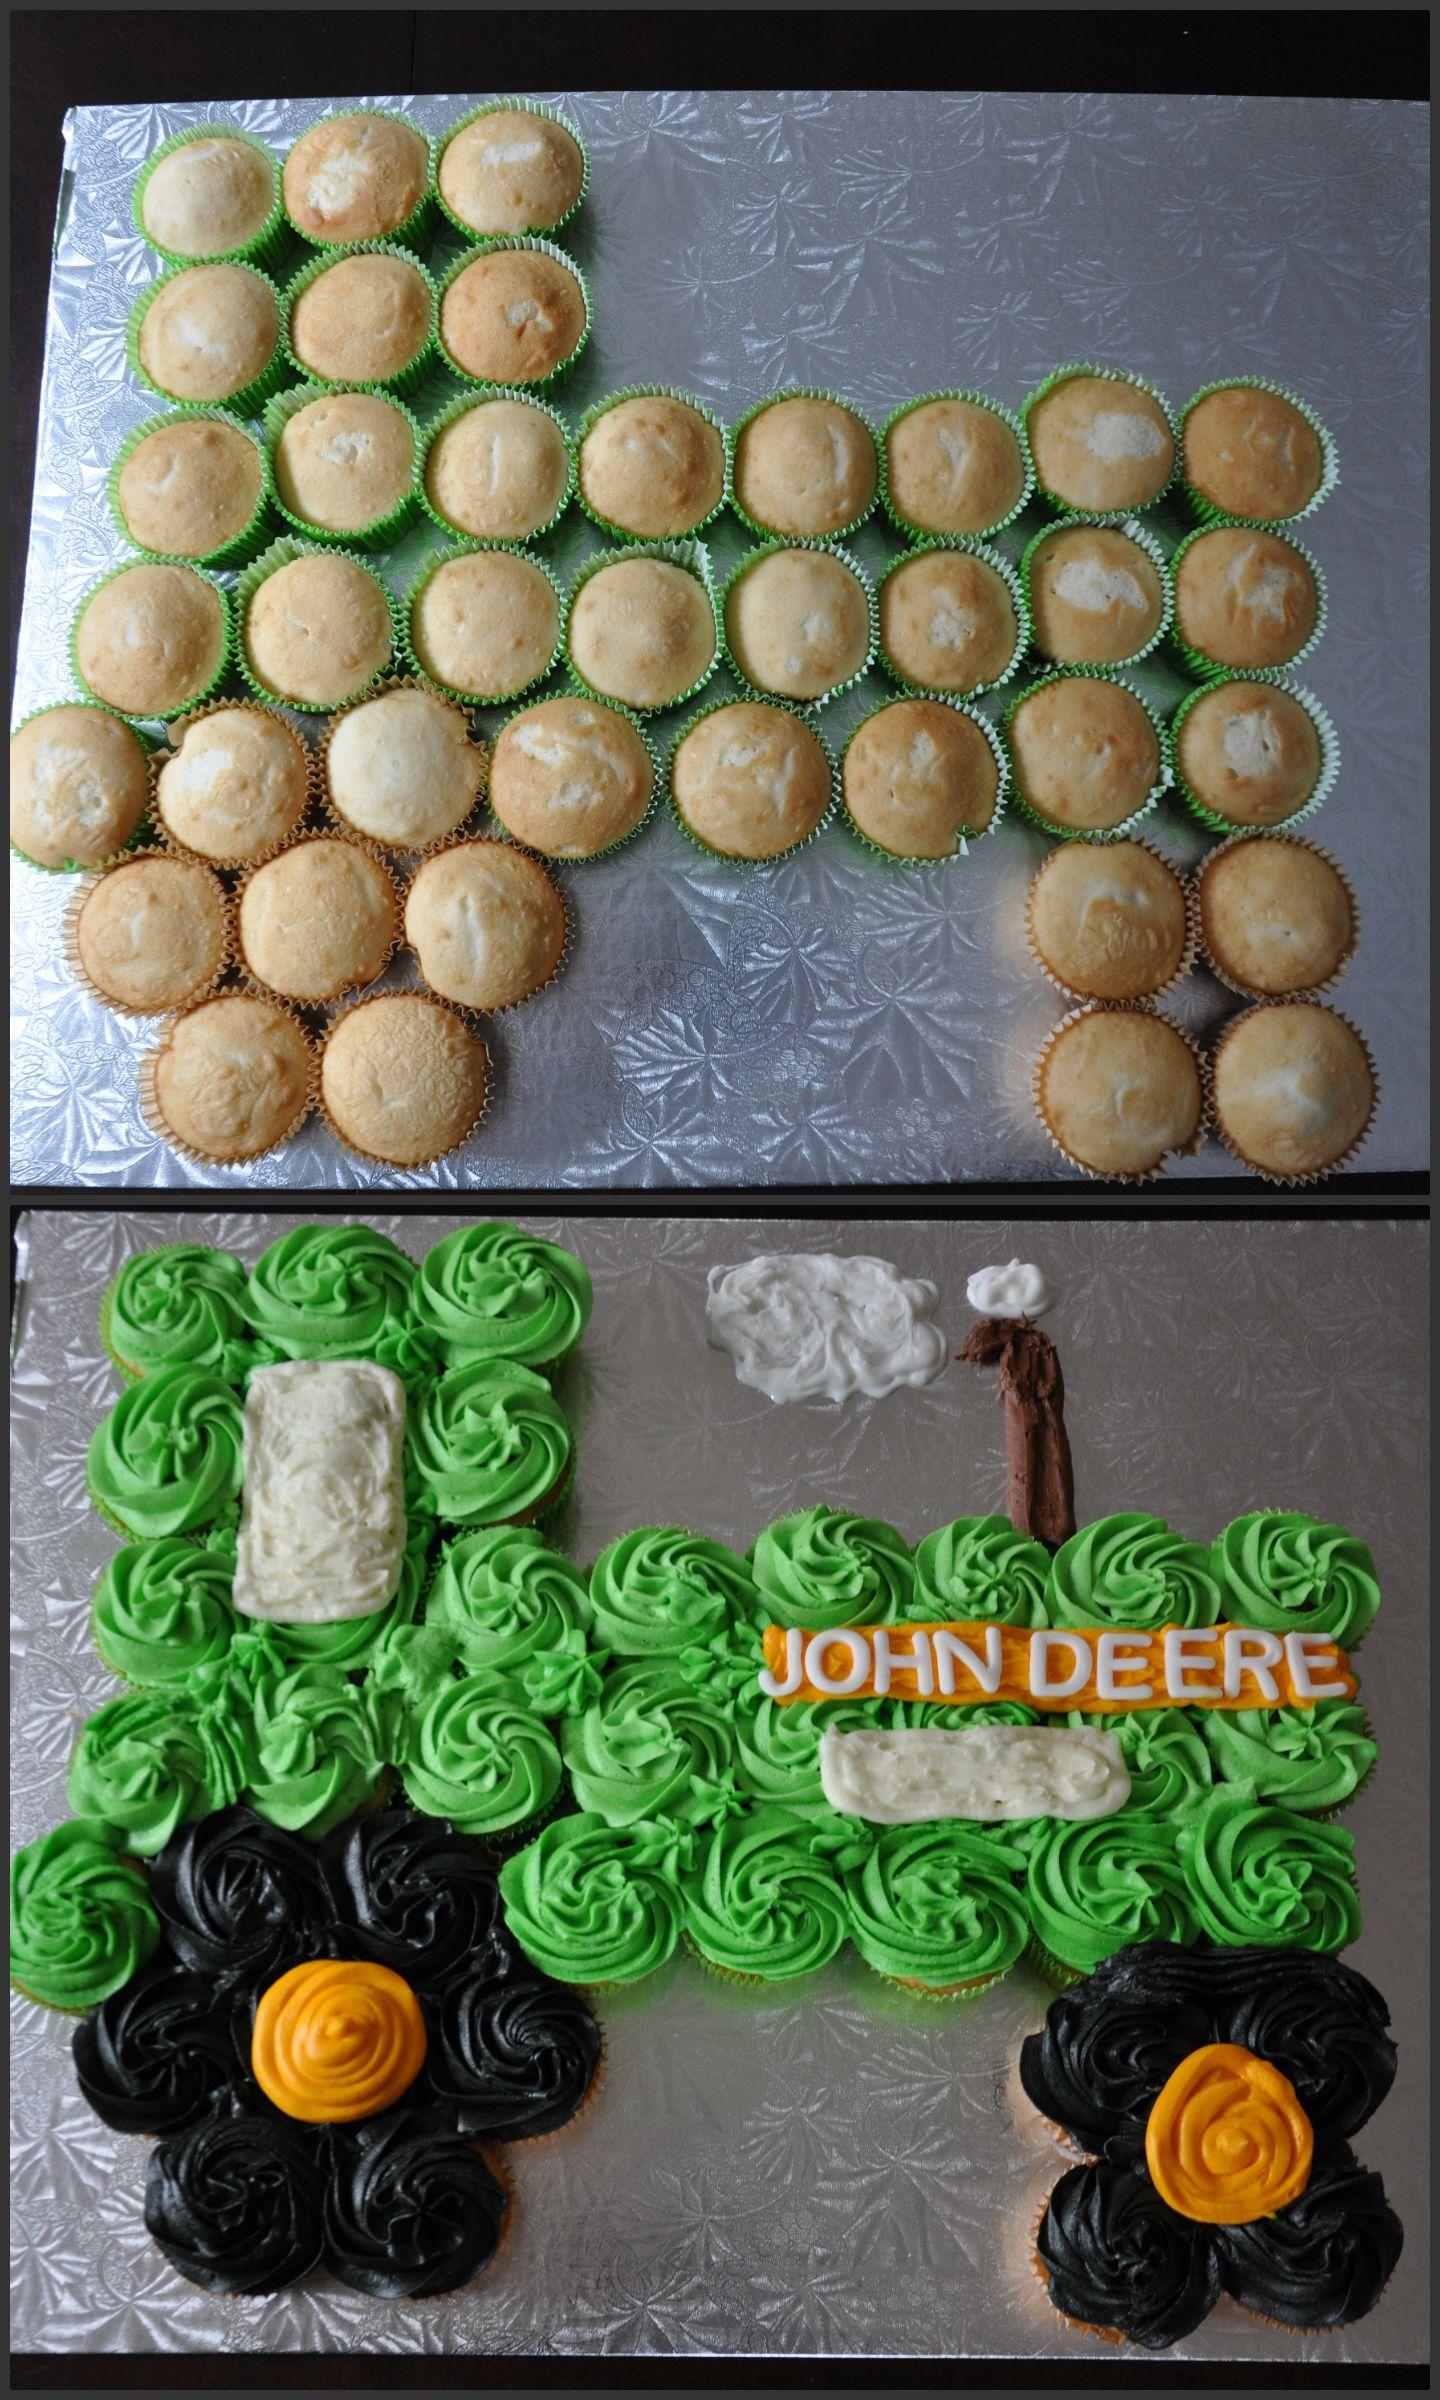 John Deere Tractor Cupcake Cake for my sons 7th birthday